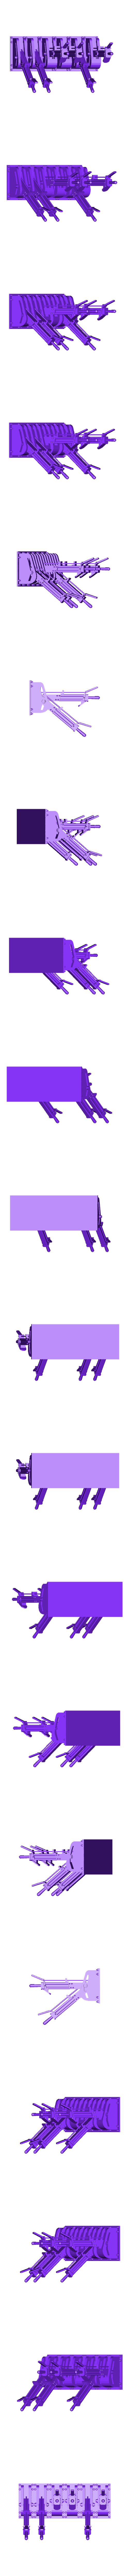 6 levier saxby echelle HO.stl Download STL file 6 Saxby HO lever • 3D printing model, beersaertsherve4189